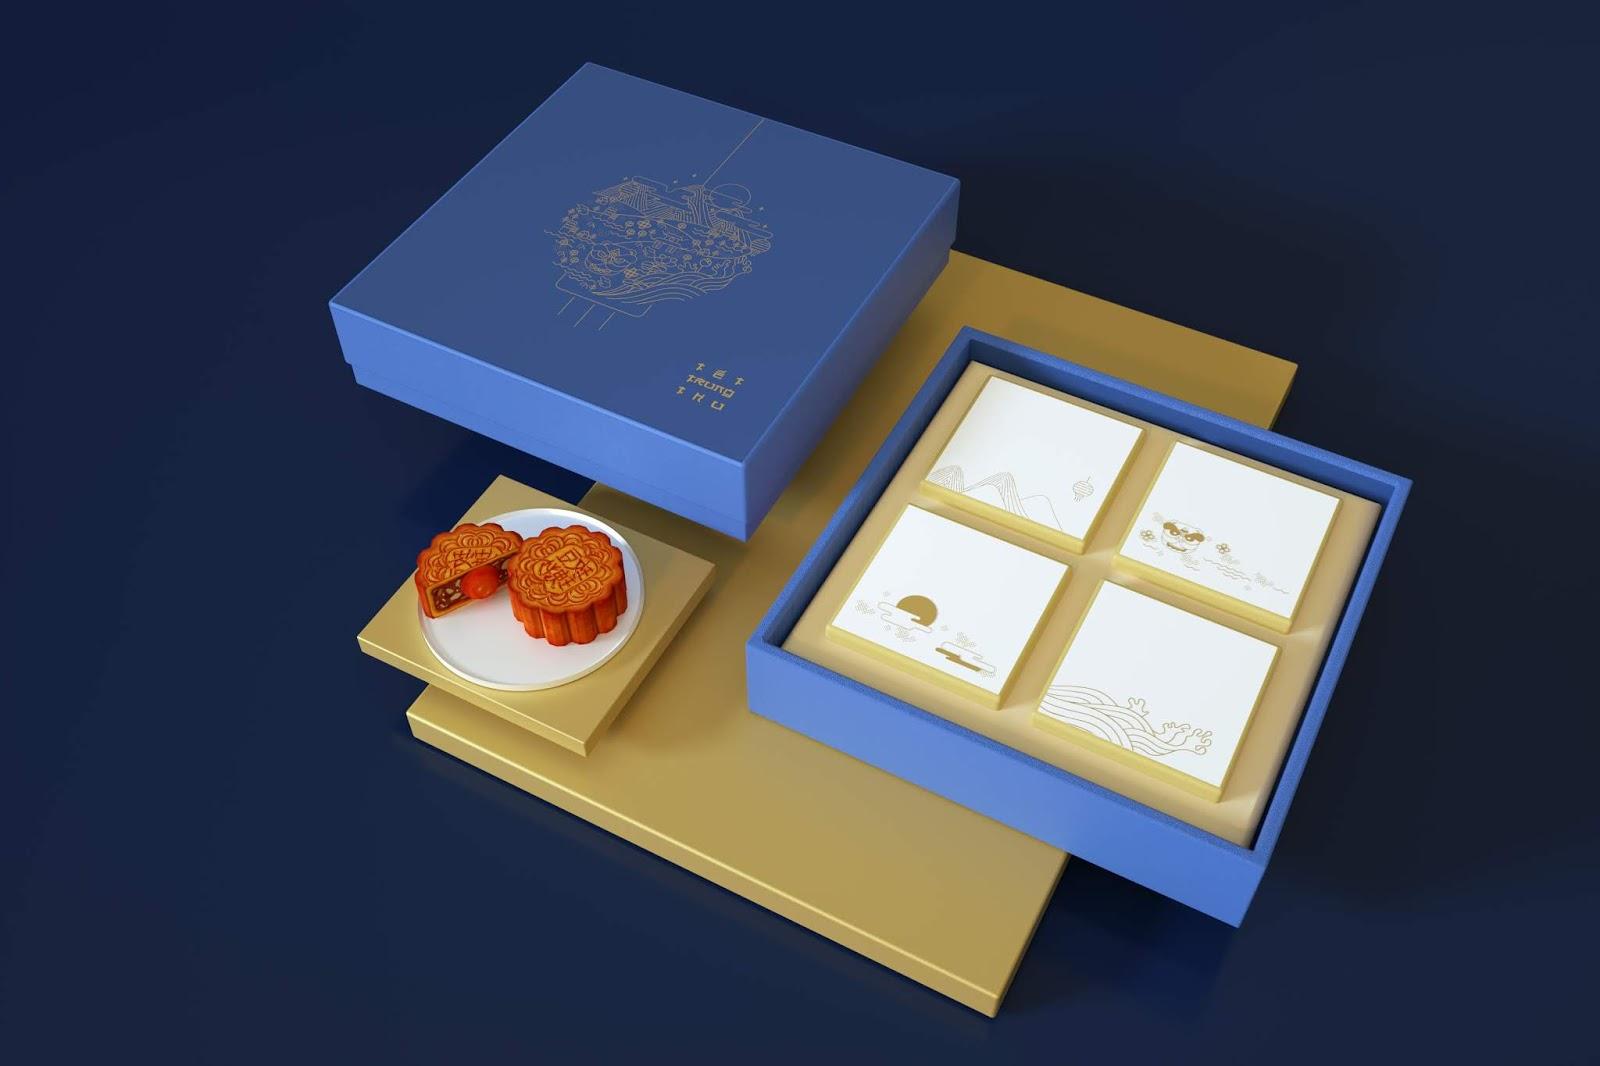 Tet Trung Thu 月饼新年礼4